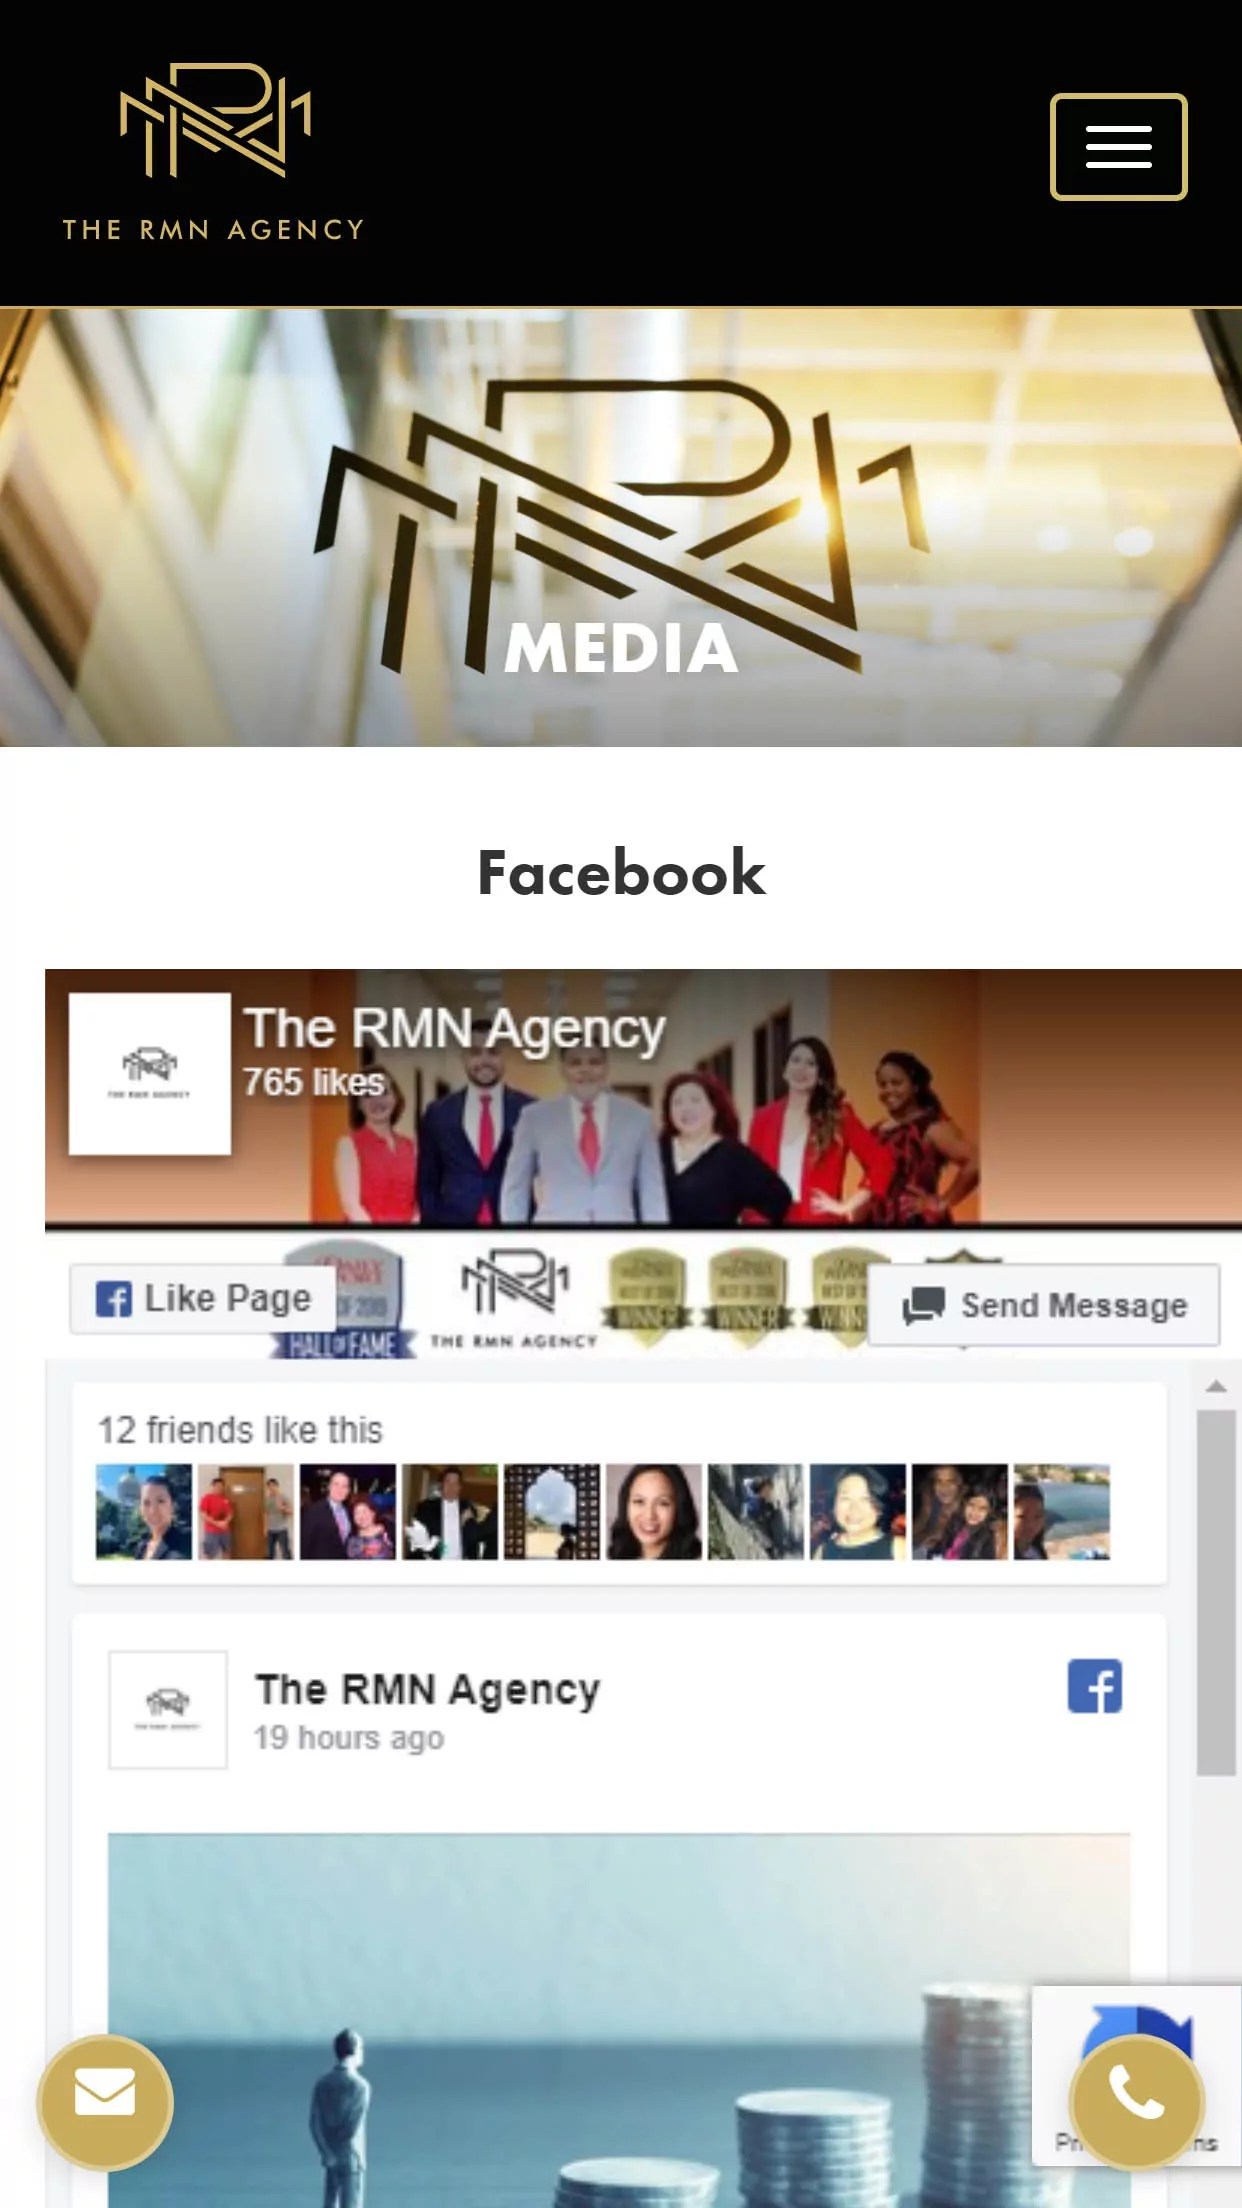 rmn-agency-mobile-web-design-3